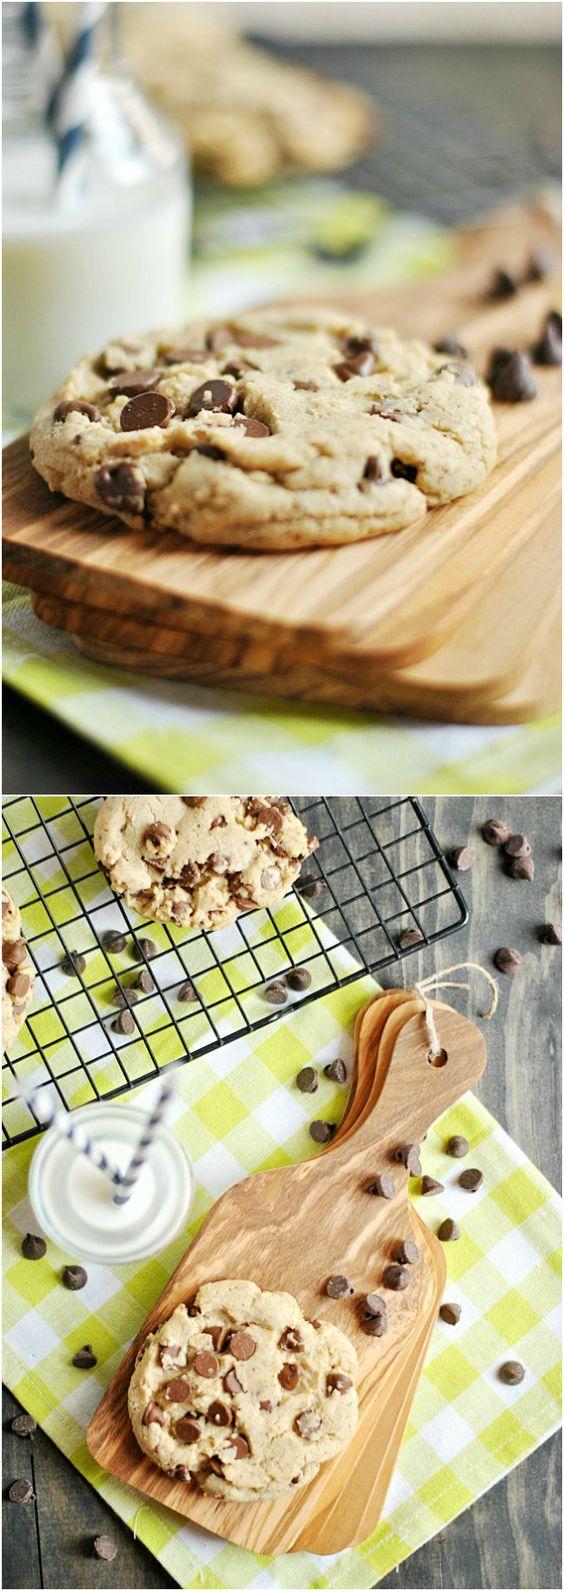 Neiman Marcus Chocolate Chip Cookie Recipe Coffee